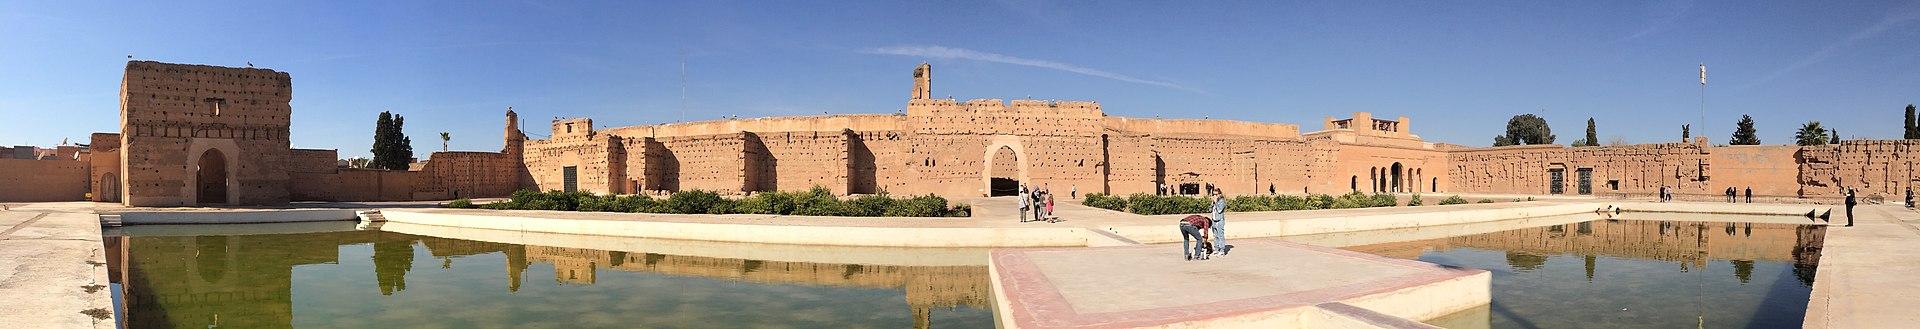 El Badi Palace Panorama 2.jpg